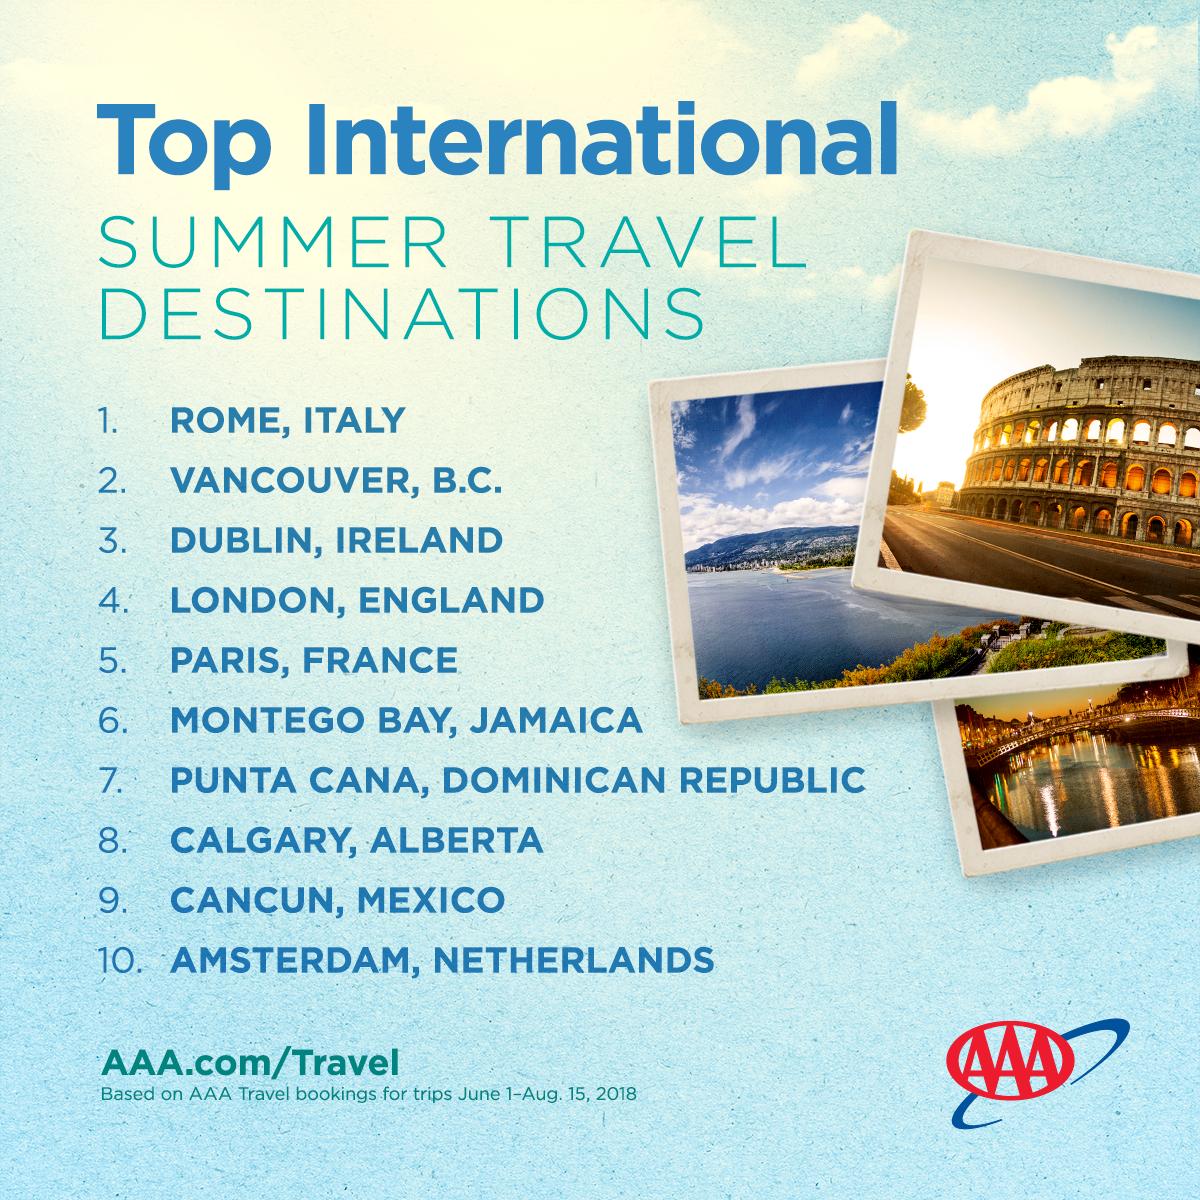 AAA Travel Booking reveals top summer vacation destinations